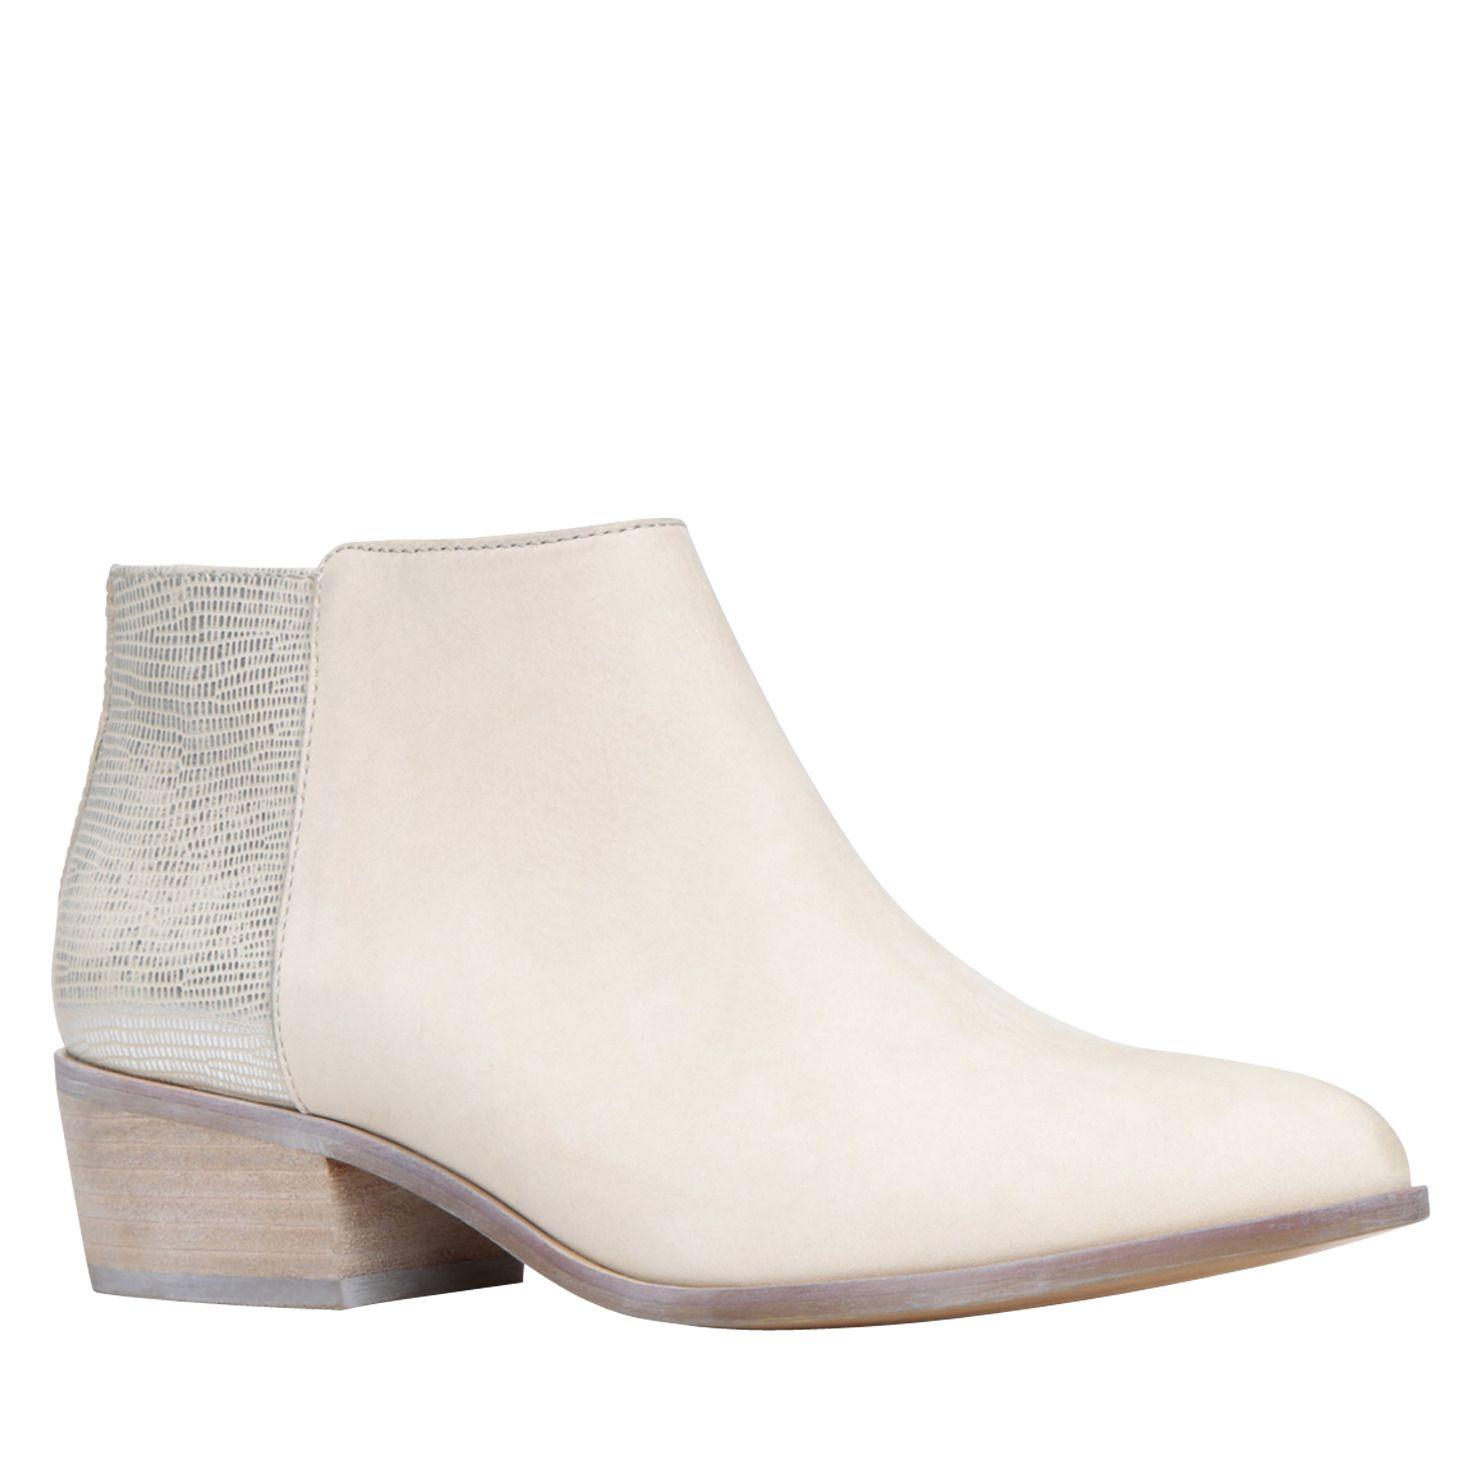 008aee479df ALIENG - sale s sale boots women for sale at ALDO Shoes.